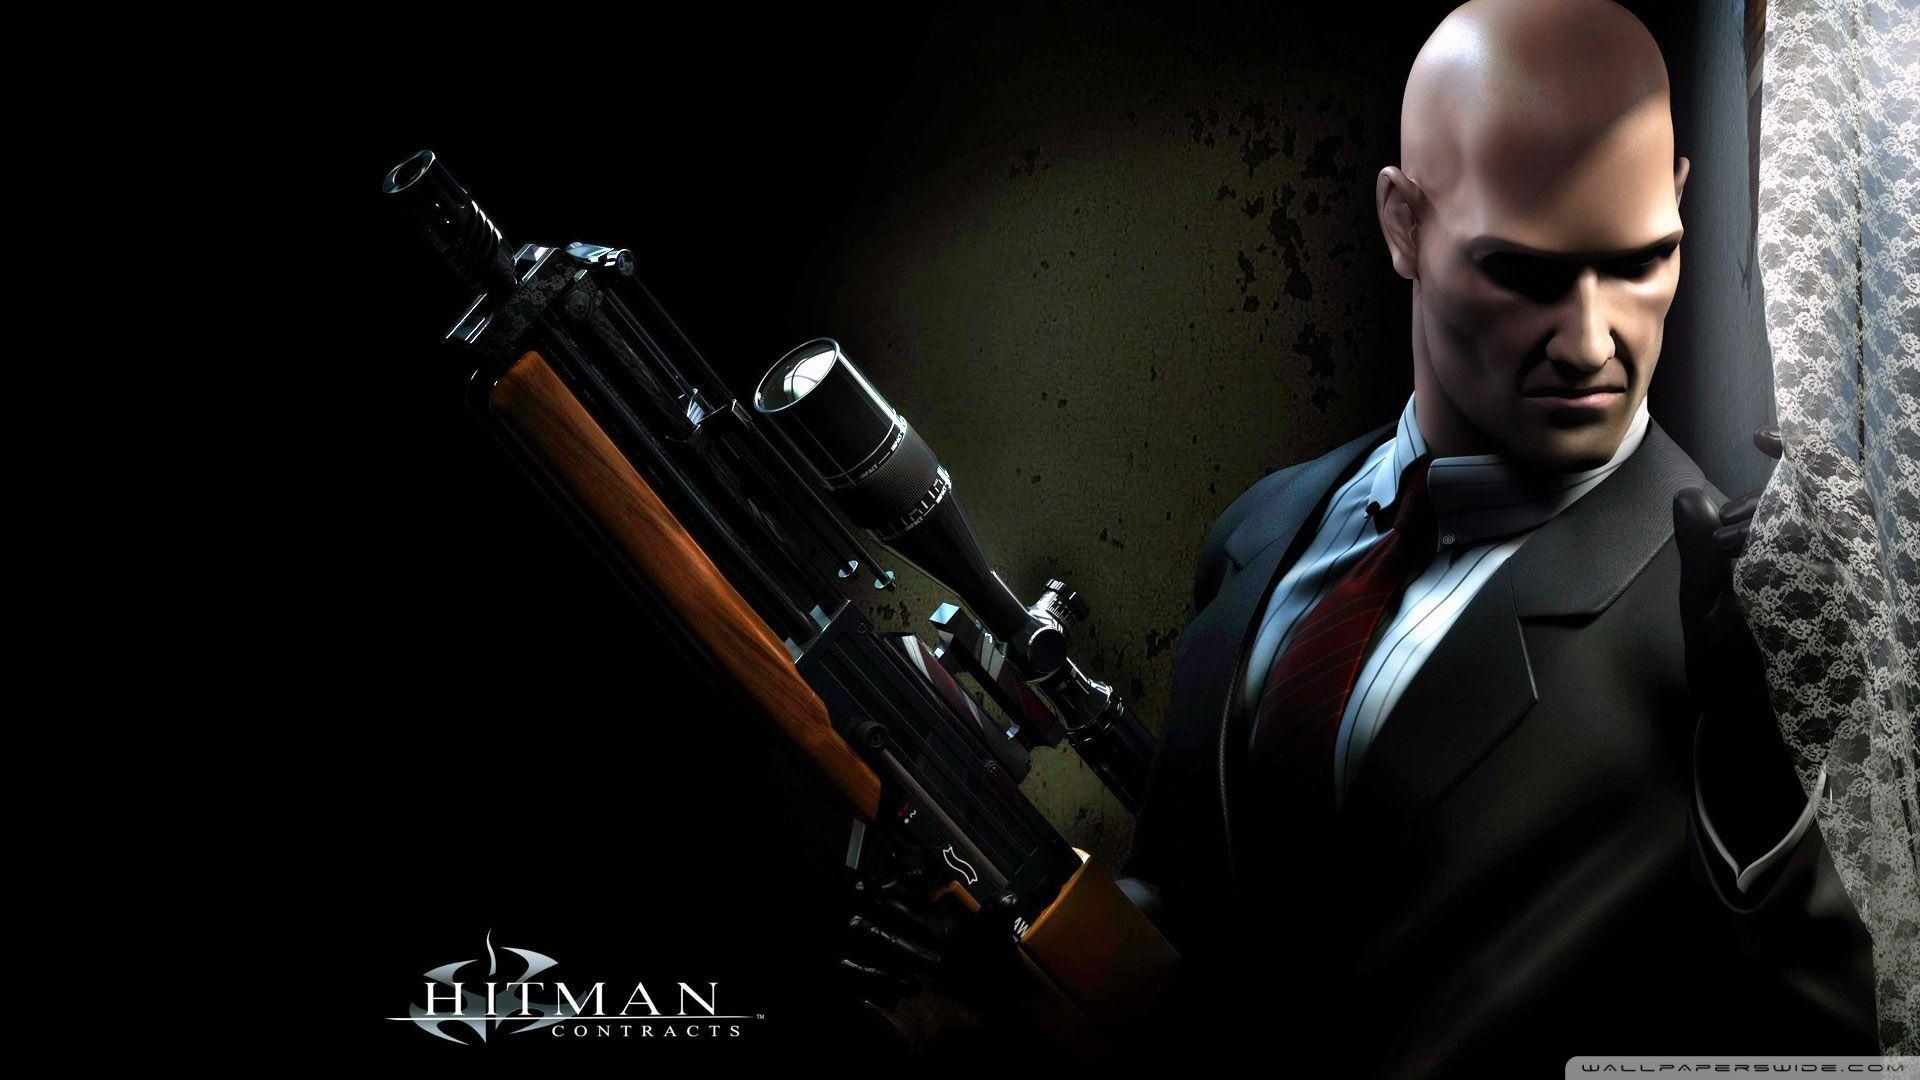 Hitman Wallpaper Widescreen Z84 Hitman Hitman Agent 47 Agent 47